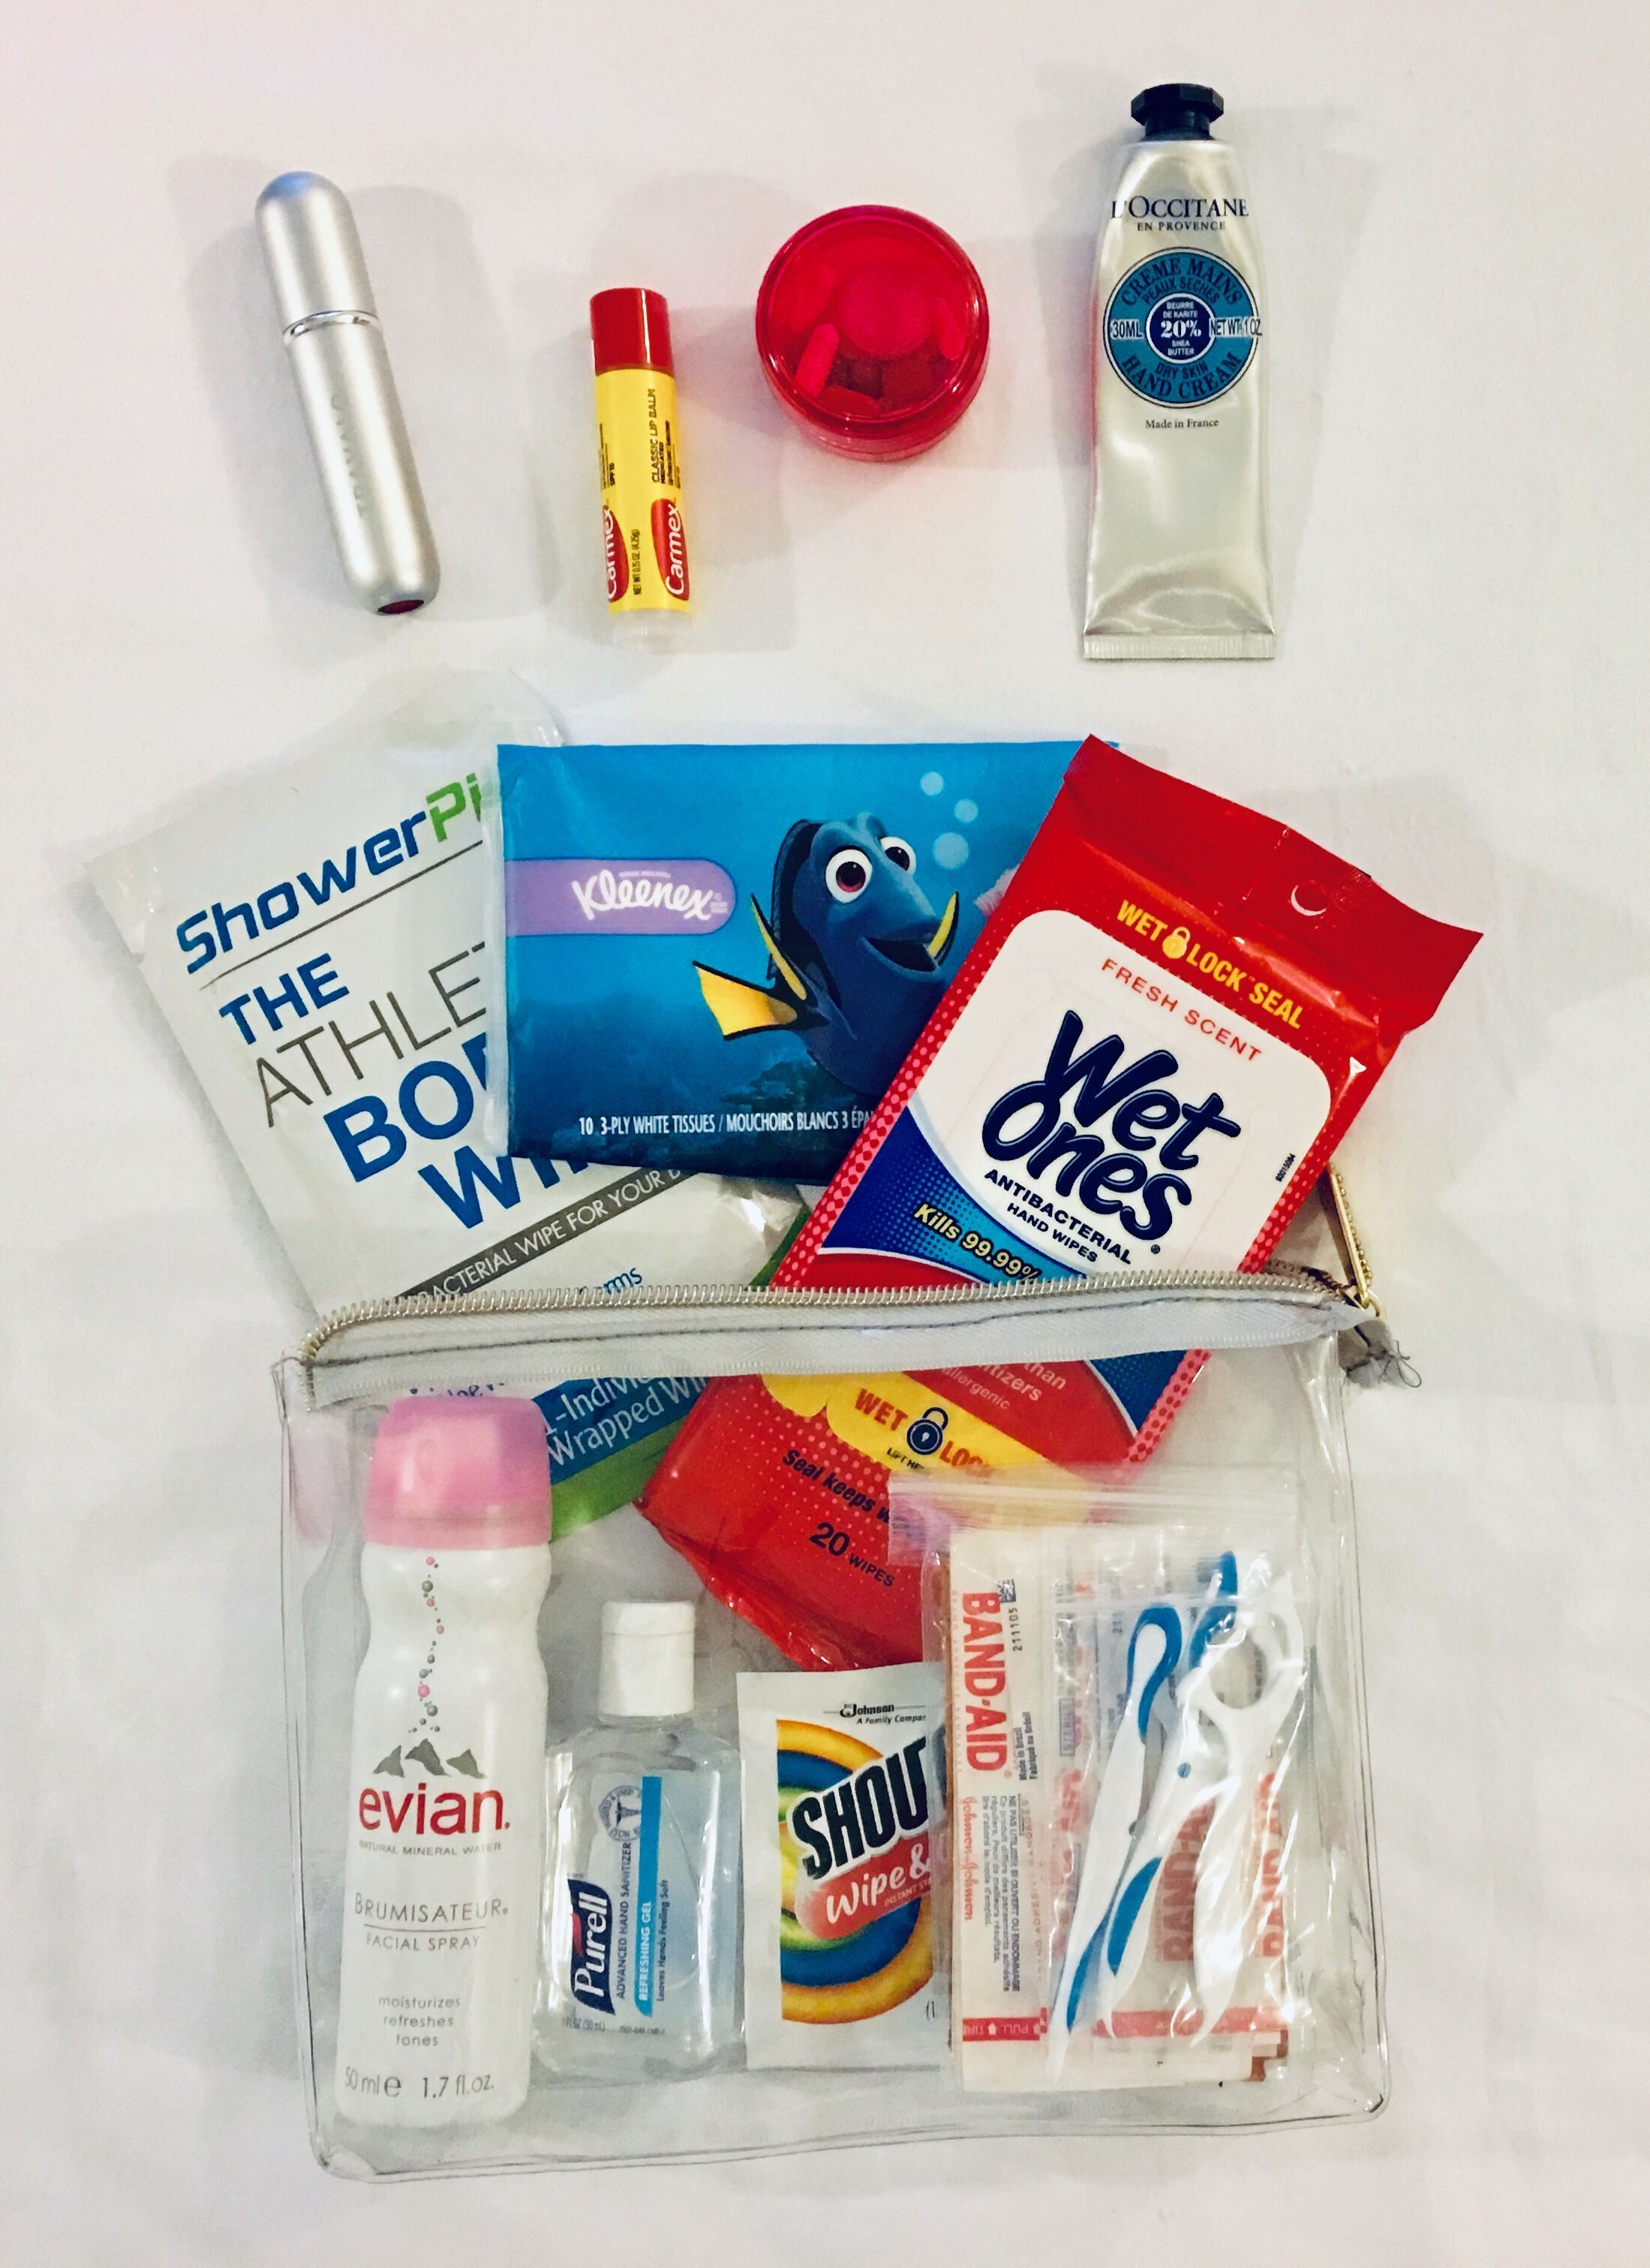 One Quart Bag For Liquids For My Carry On 1 Oz Hand Sanitizer For